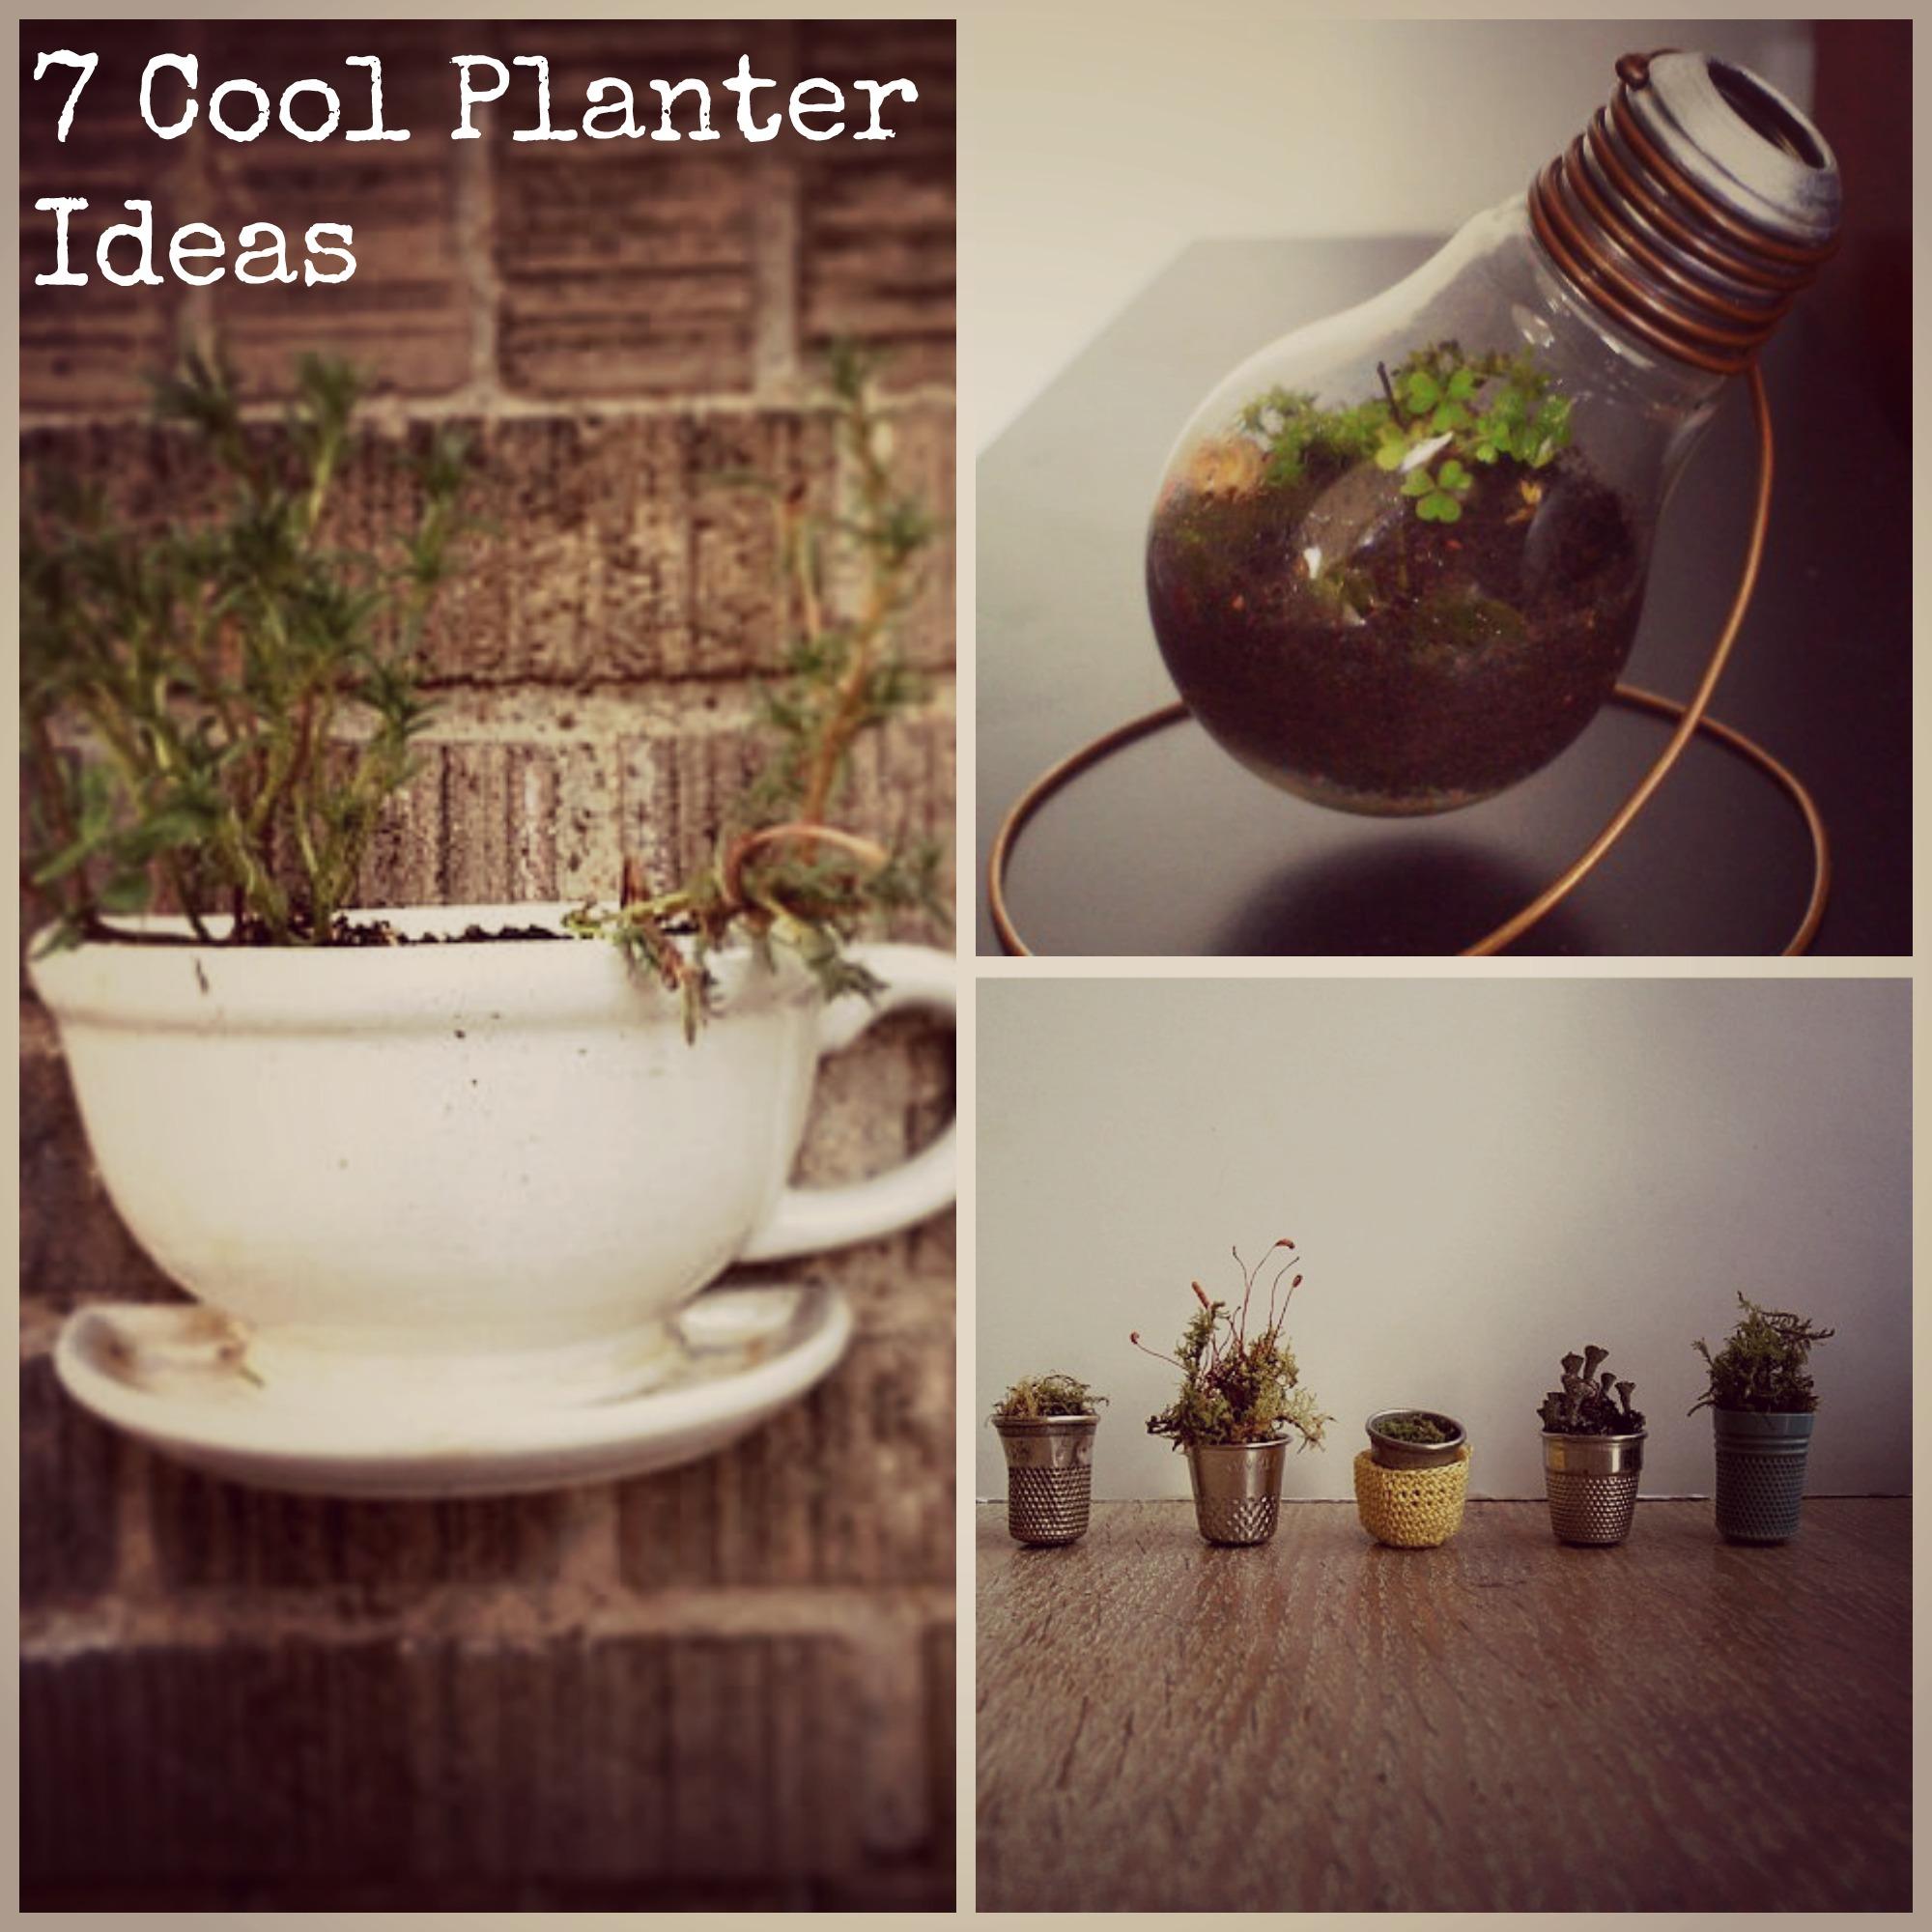 Planter ideas main image